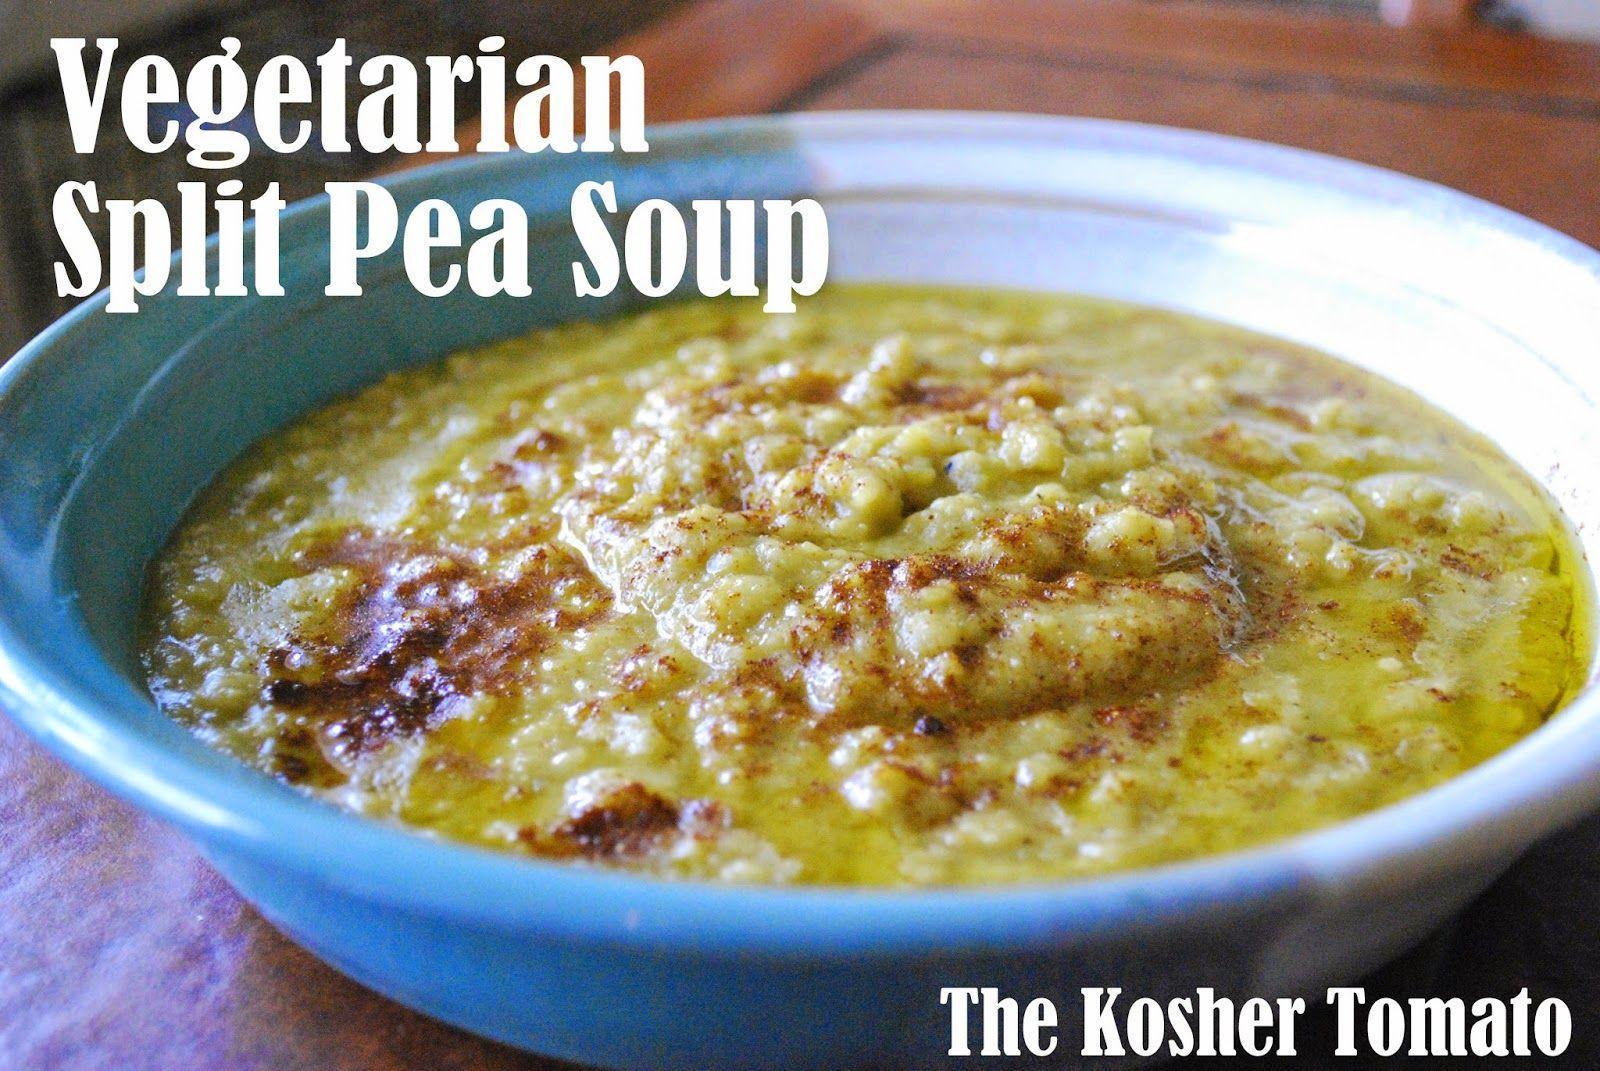 The Kosher Tomato: Vegetarian Split Pea Soup